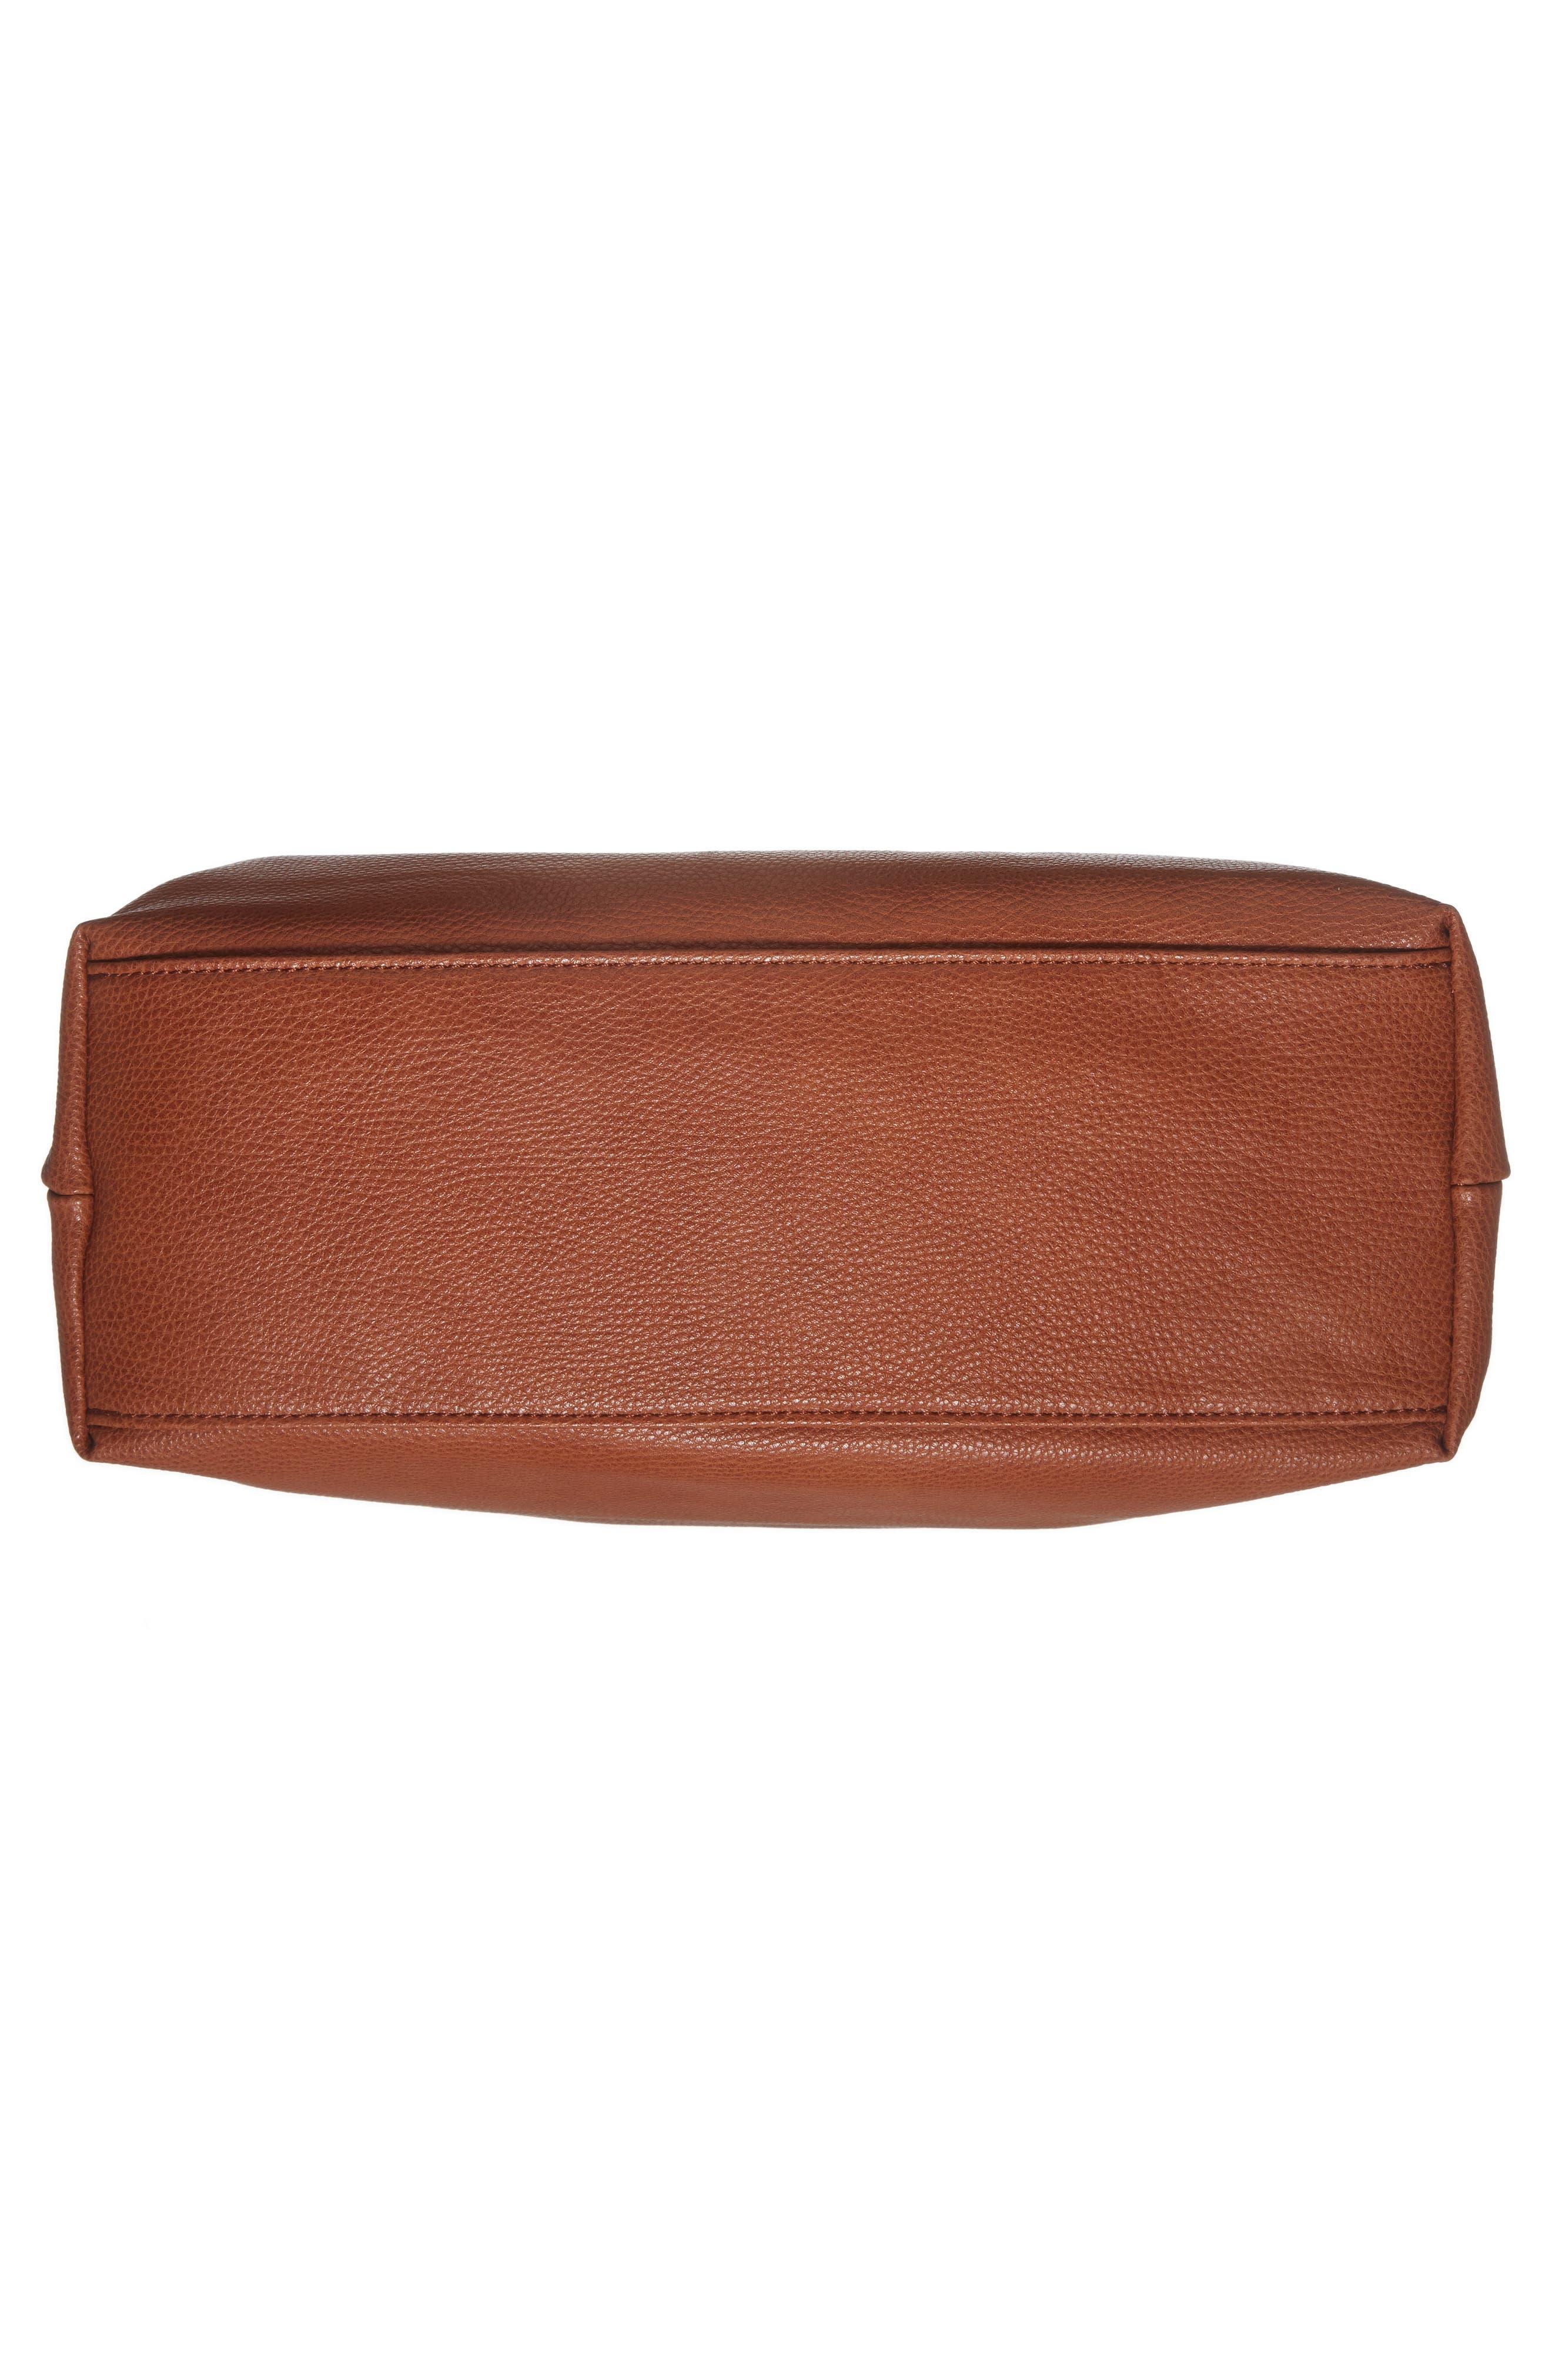 Taylor Faux Leather Shoulder Bag,                             Alternate thumbnail 18, color,